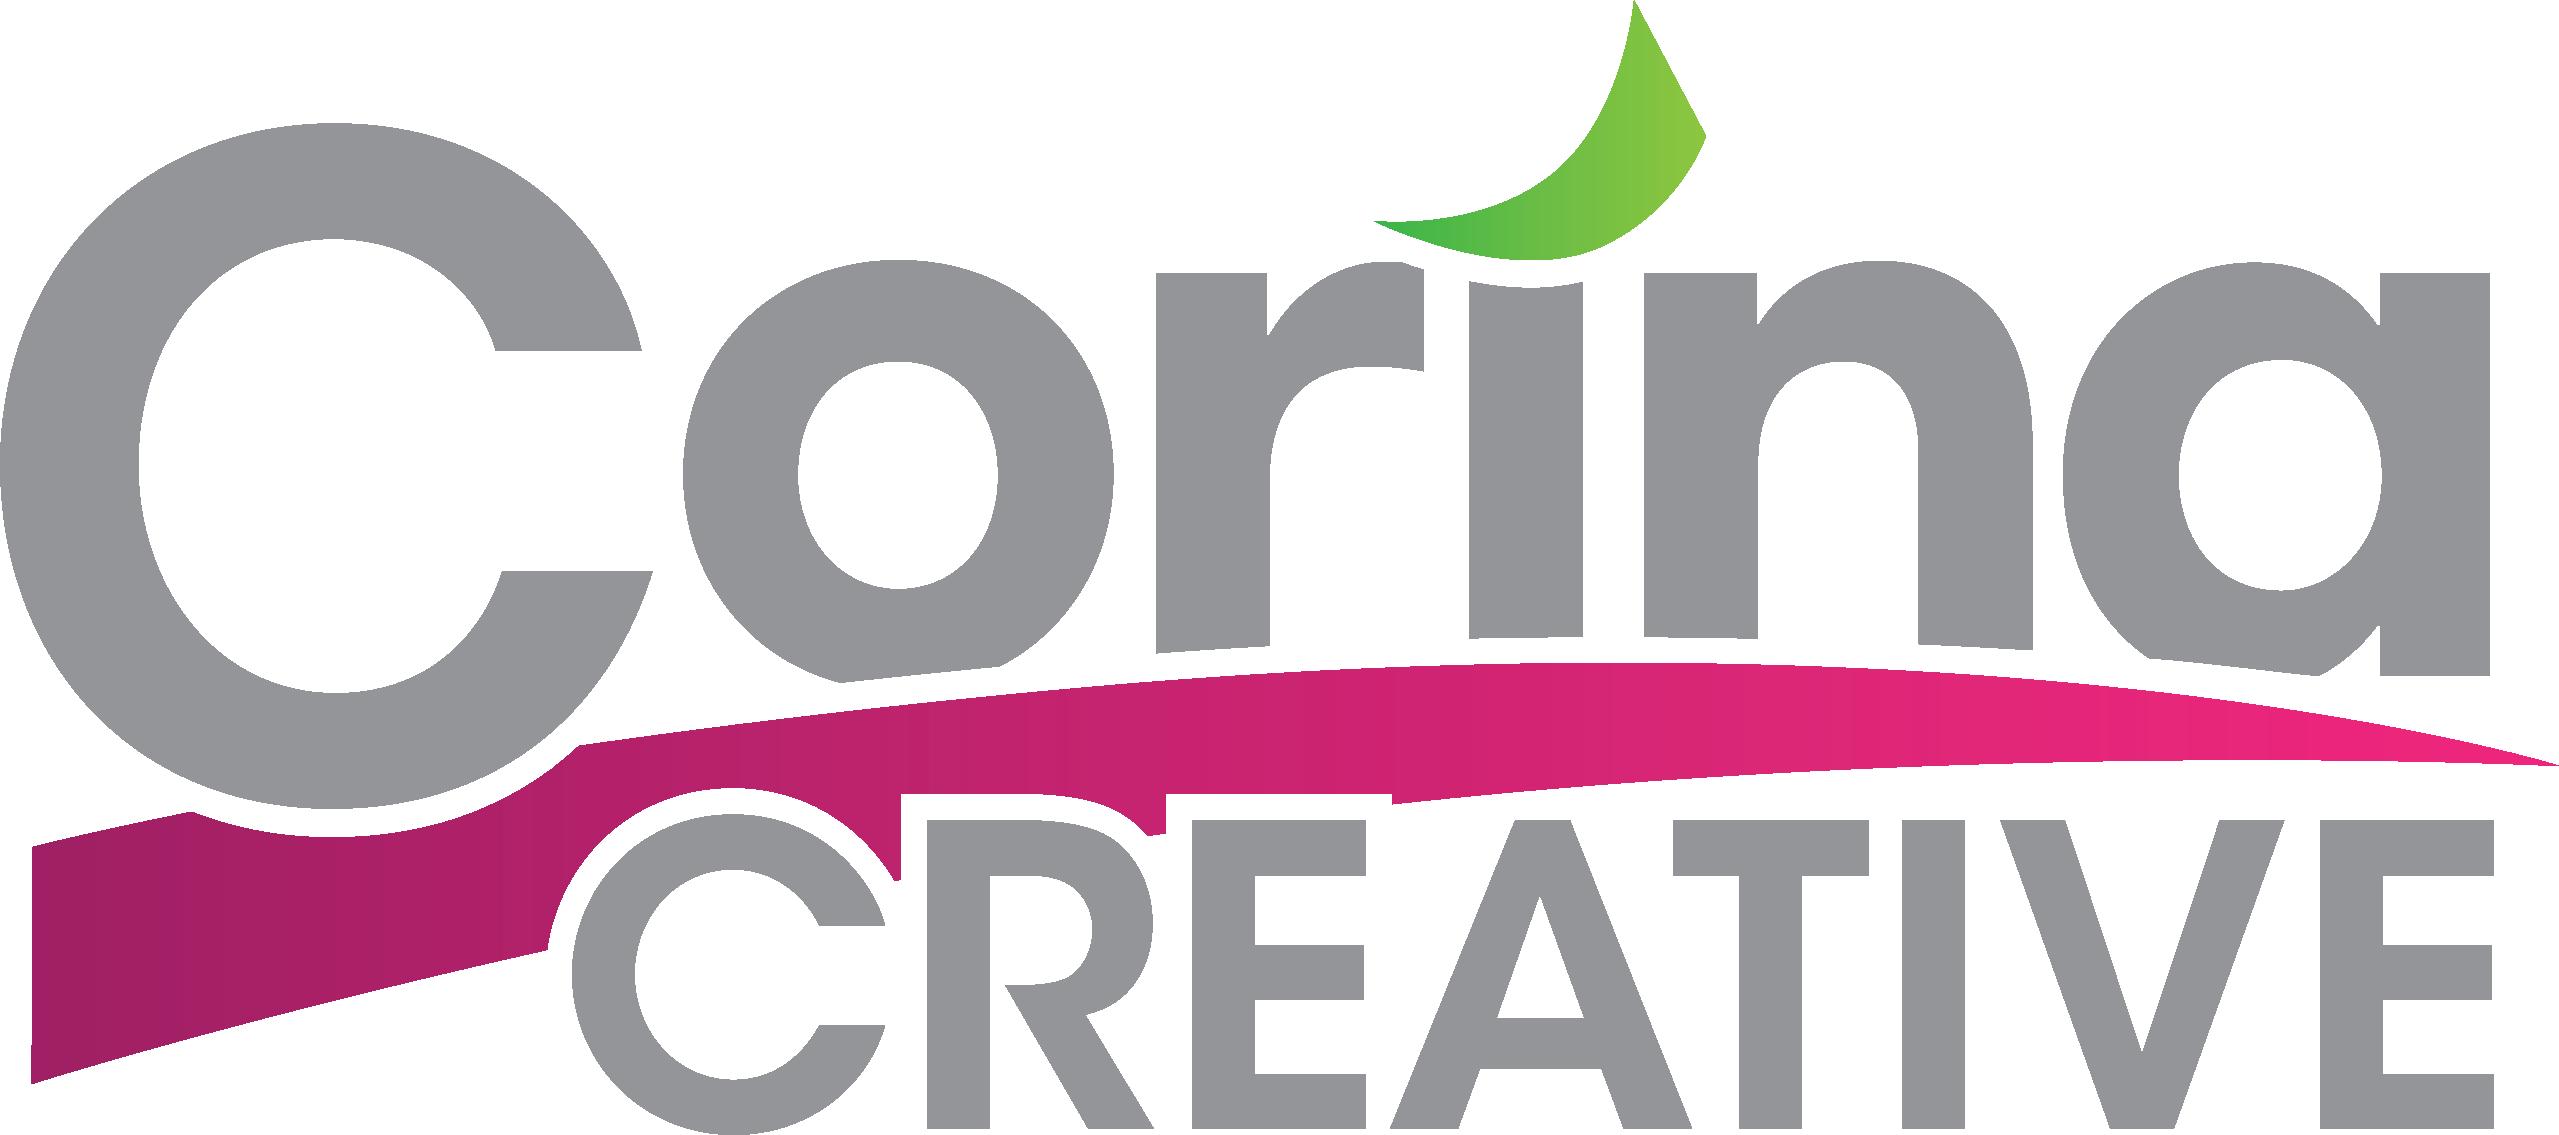 Corina Creative Logo